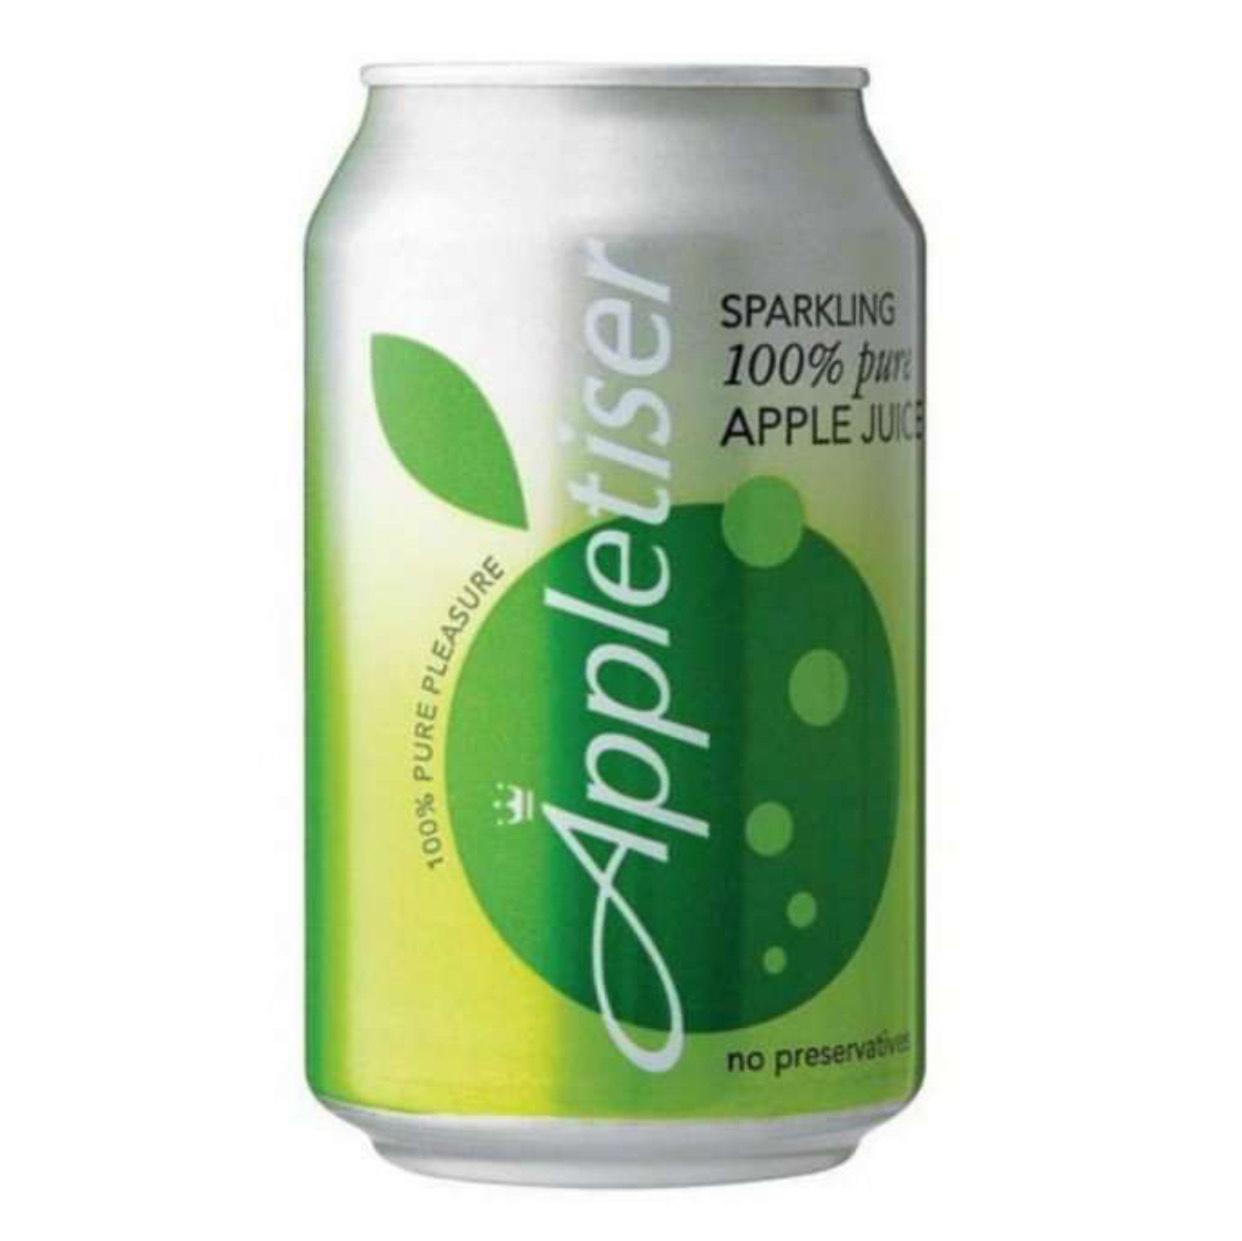 Appletiser 330ml cans 10p each Poundstretcher Mitcham